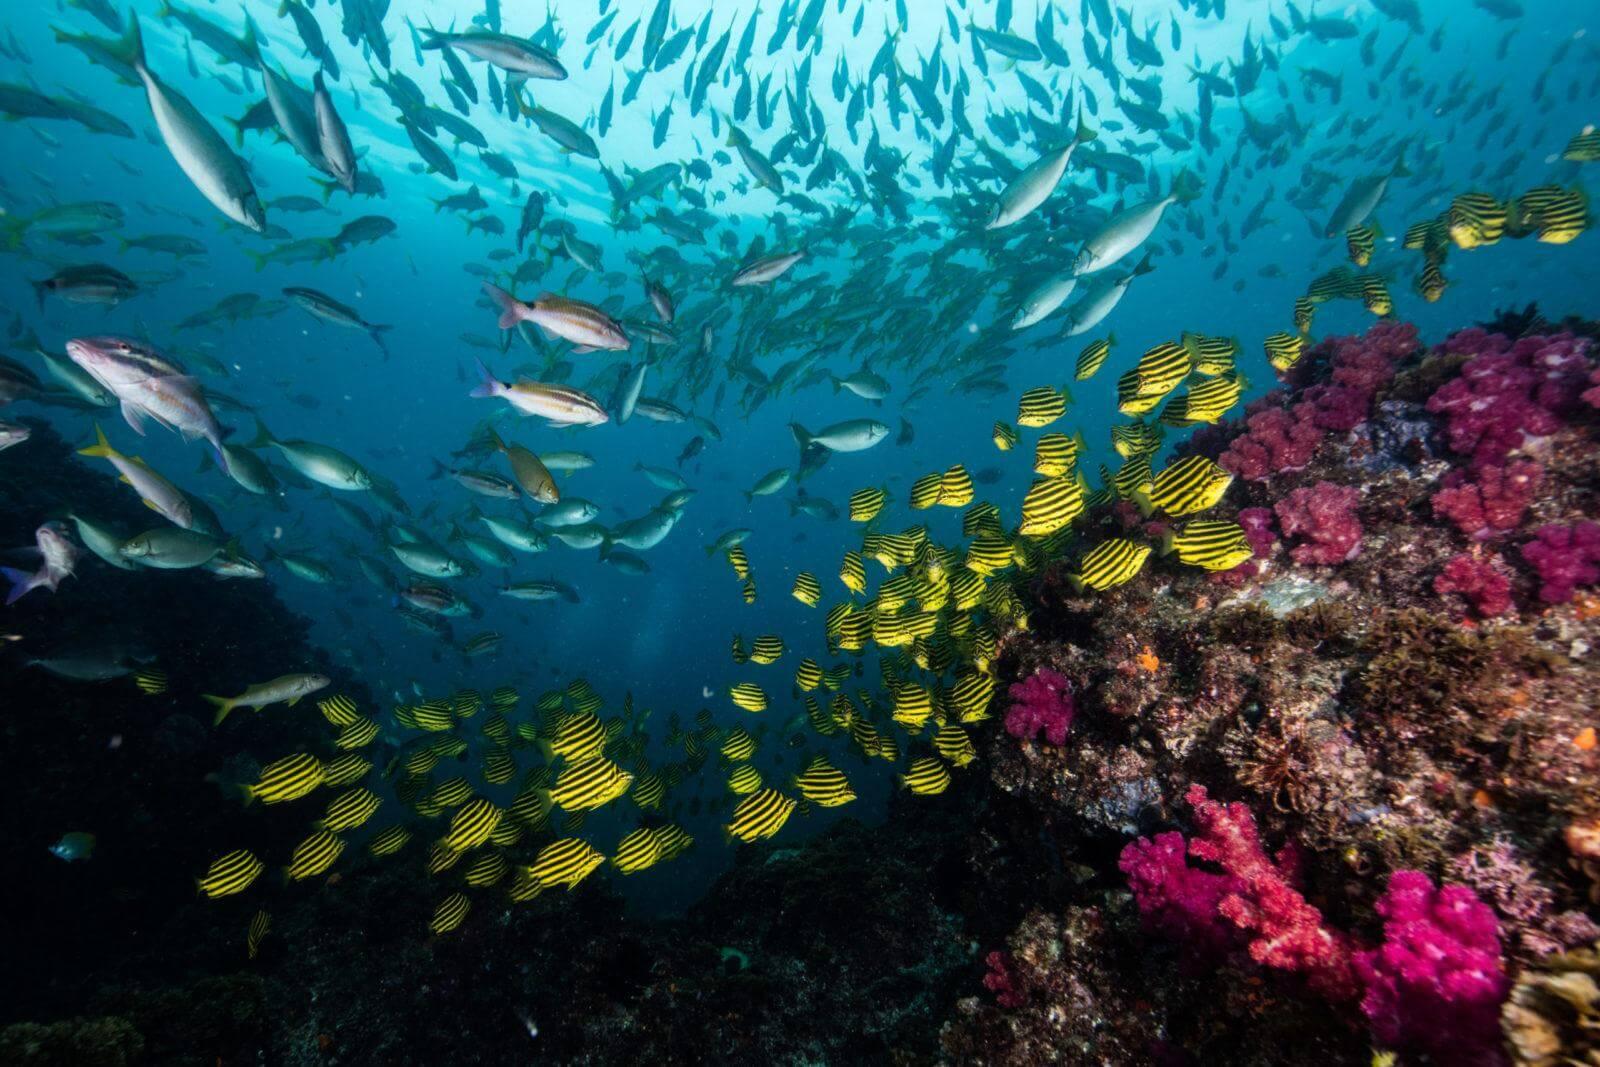 breathtaking view of underwater Winter diving at Julian Rocks in Byron Bay